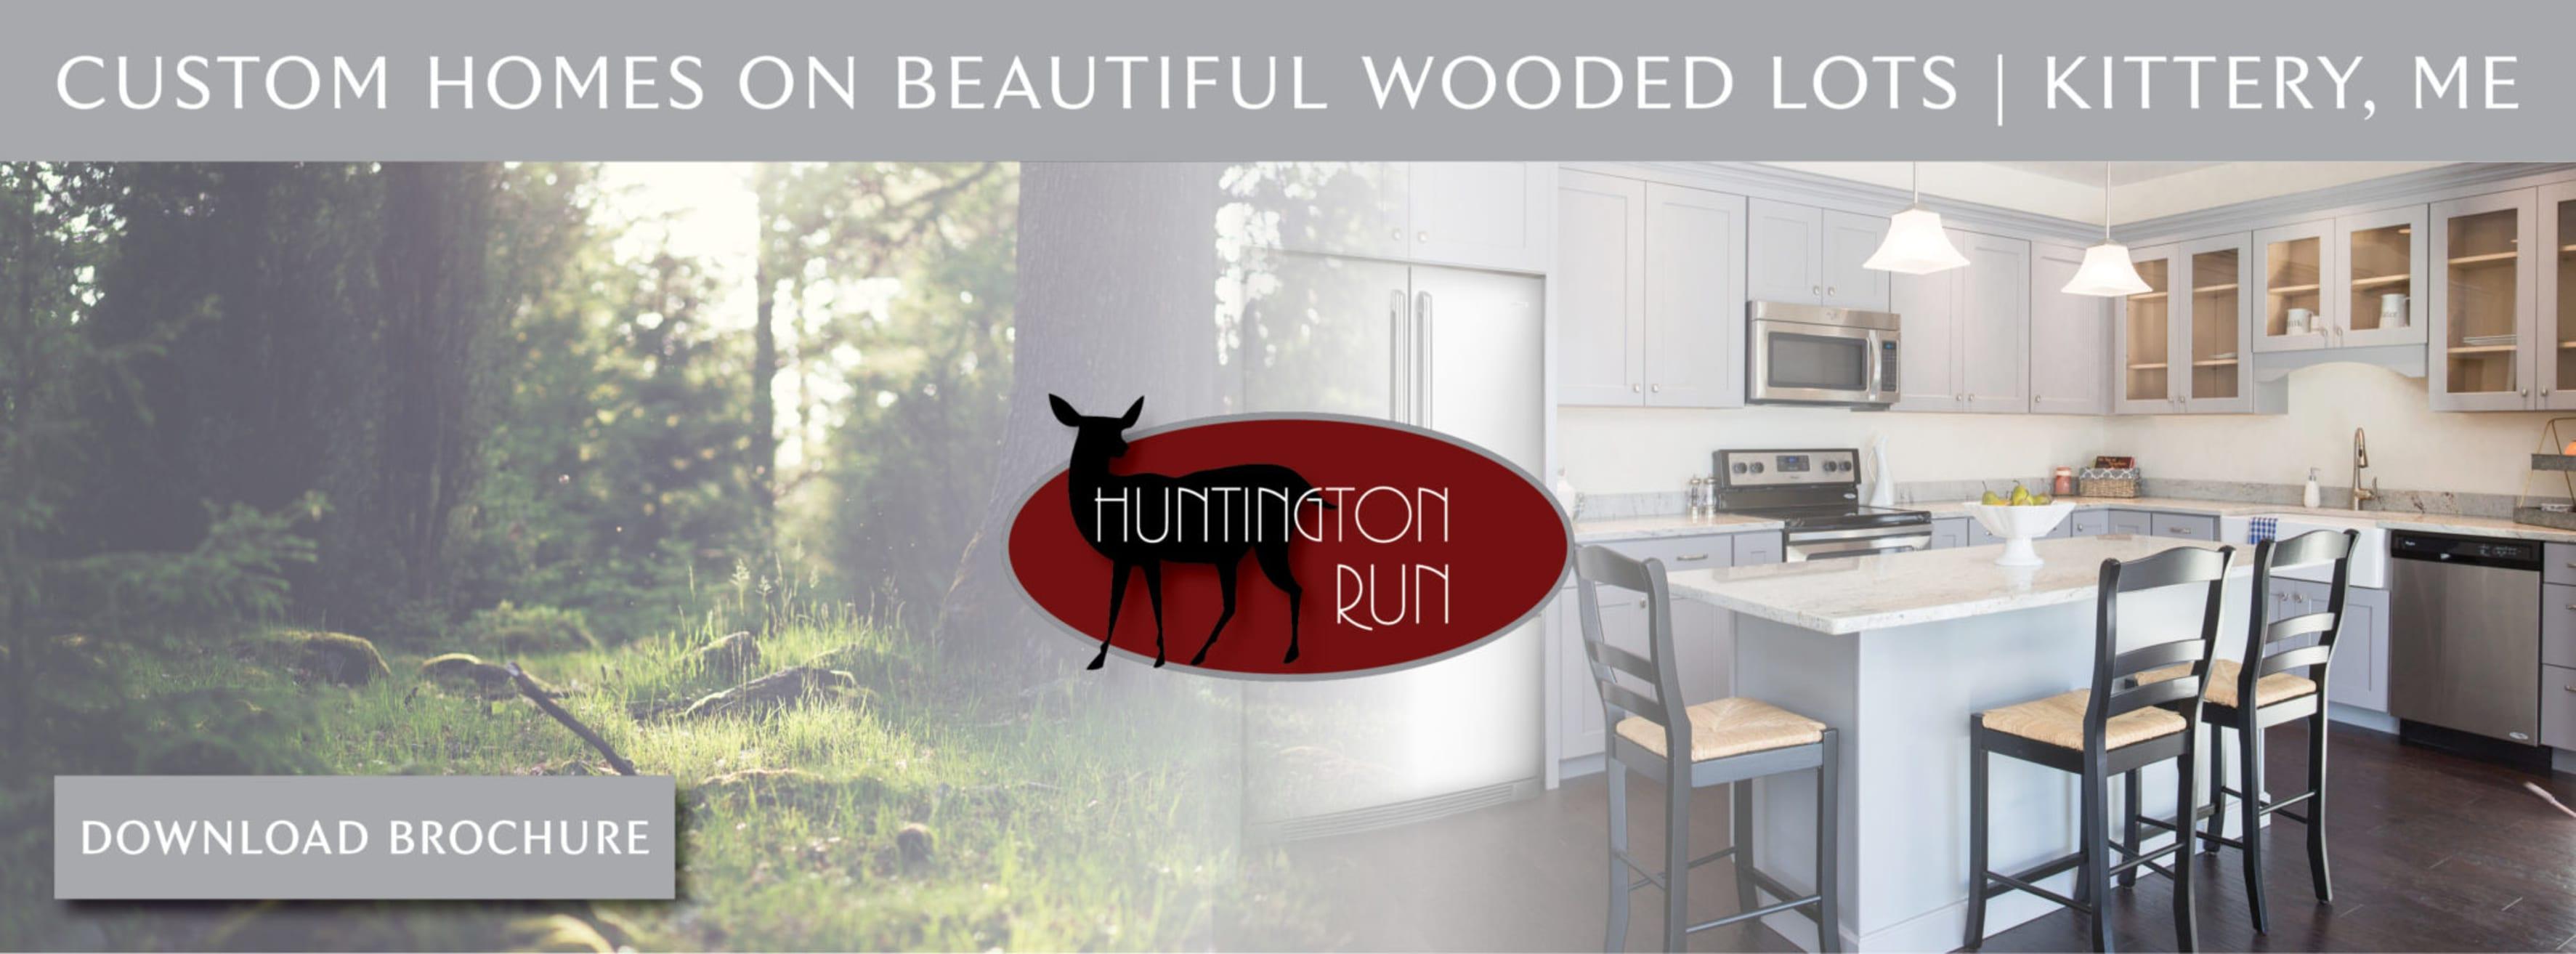 Huntington Run